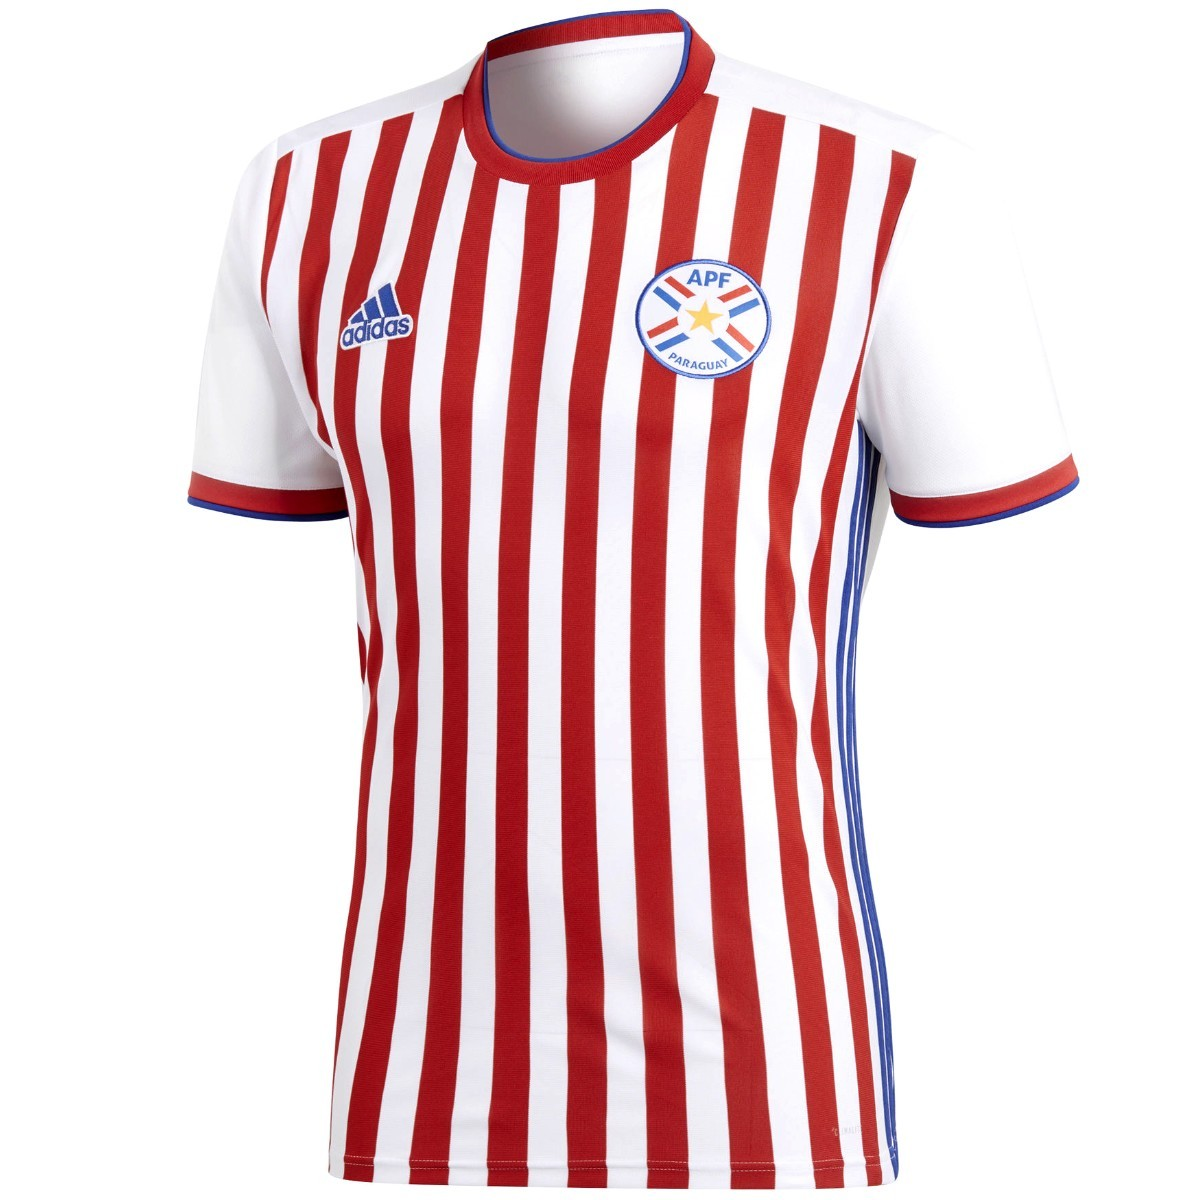 Maglia calcio Nazionale Paraguay Home 201819 Adidas